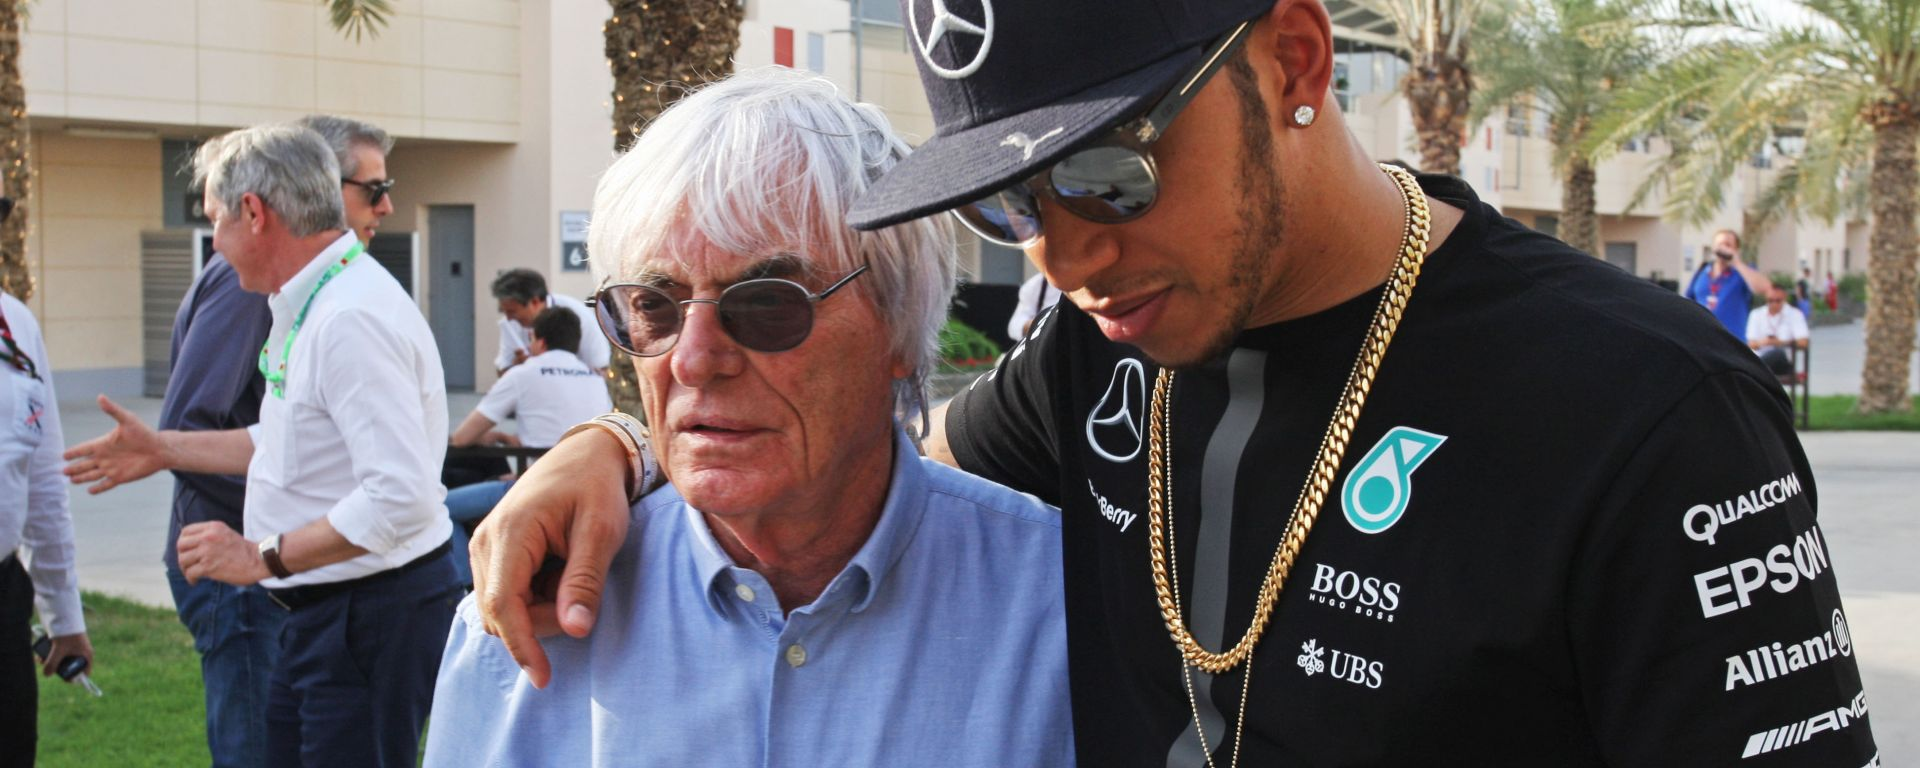 F1, GP Abu Dhabi 2015: Bernie Ecclestone e Lewis Hamilton (Mercedes)